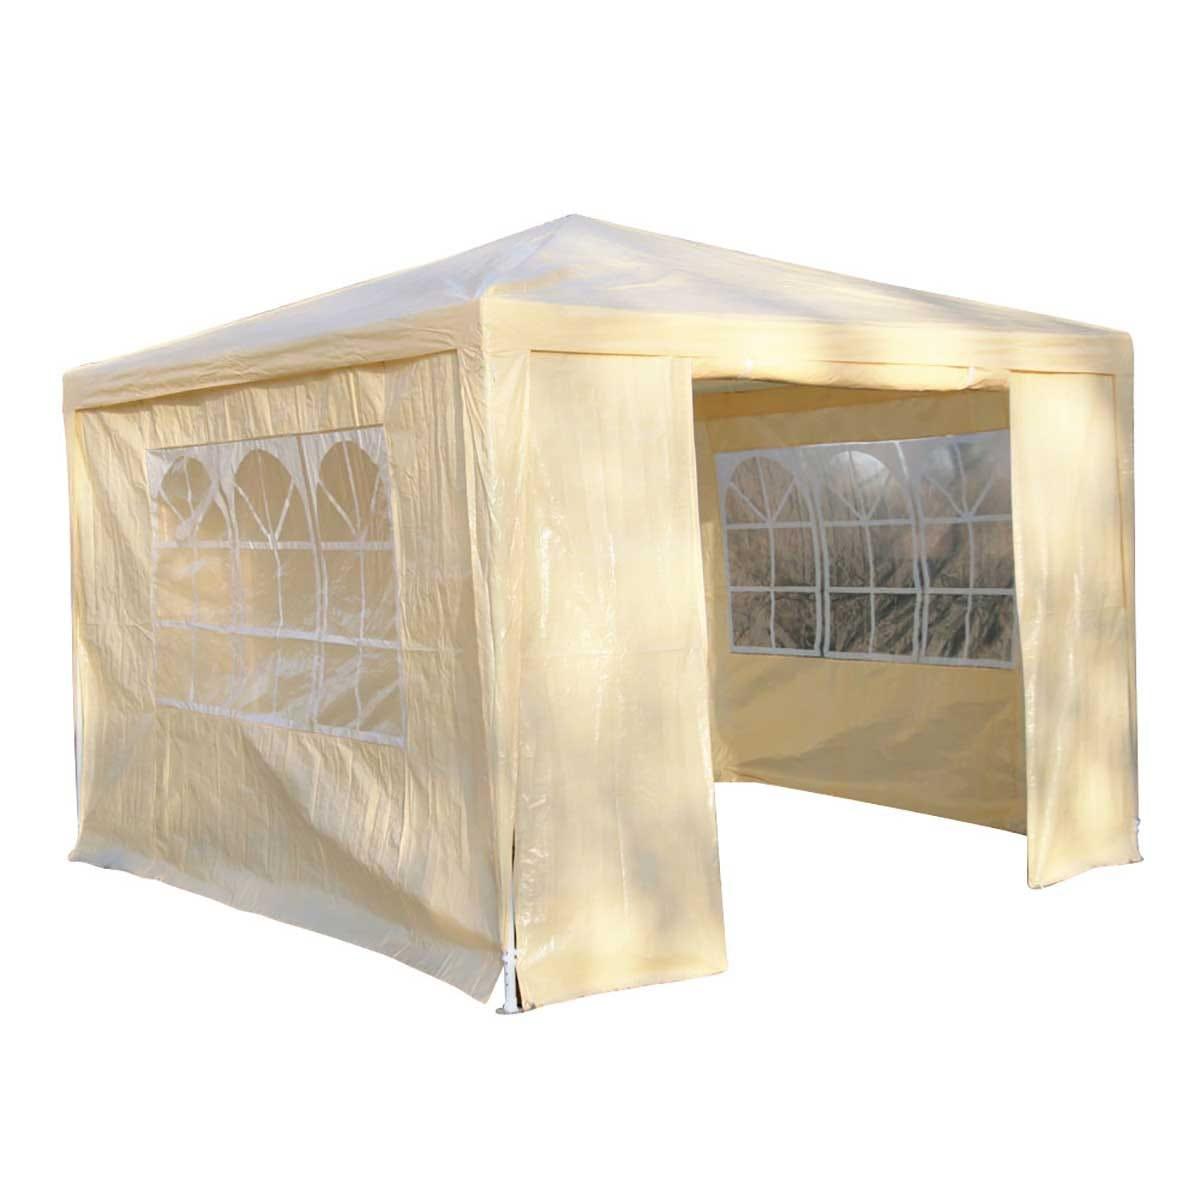 Airwave 3m x 3m Value Party Tent Gazebo - Beige